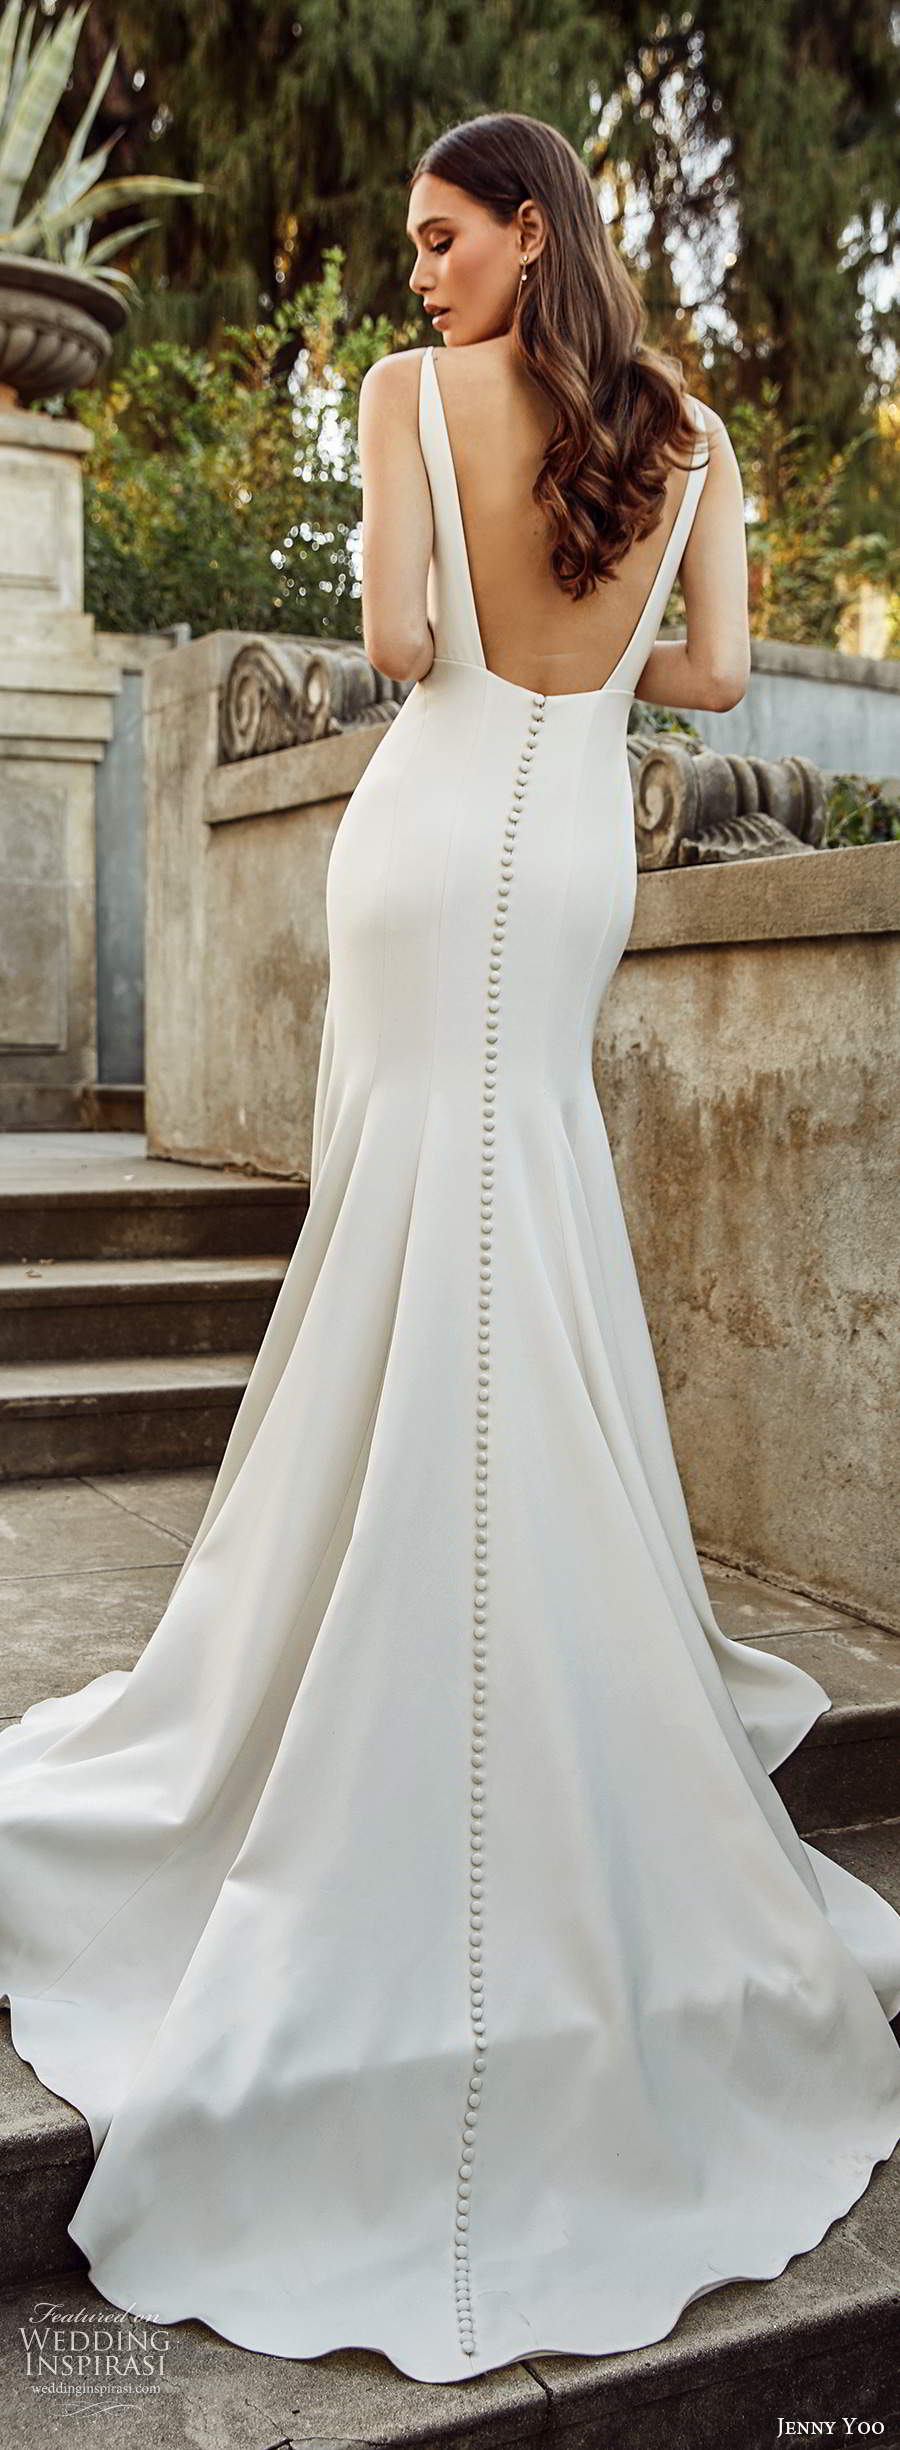 jenny yoo spring 2020 bridal sleeveless straps v neckline clean minimalist sheath fit flare mermaid wedding dress low back chapel train (9) lbv